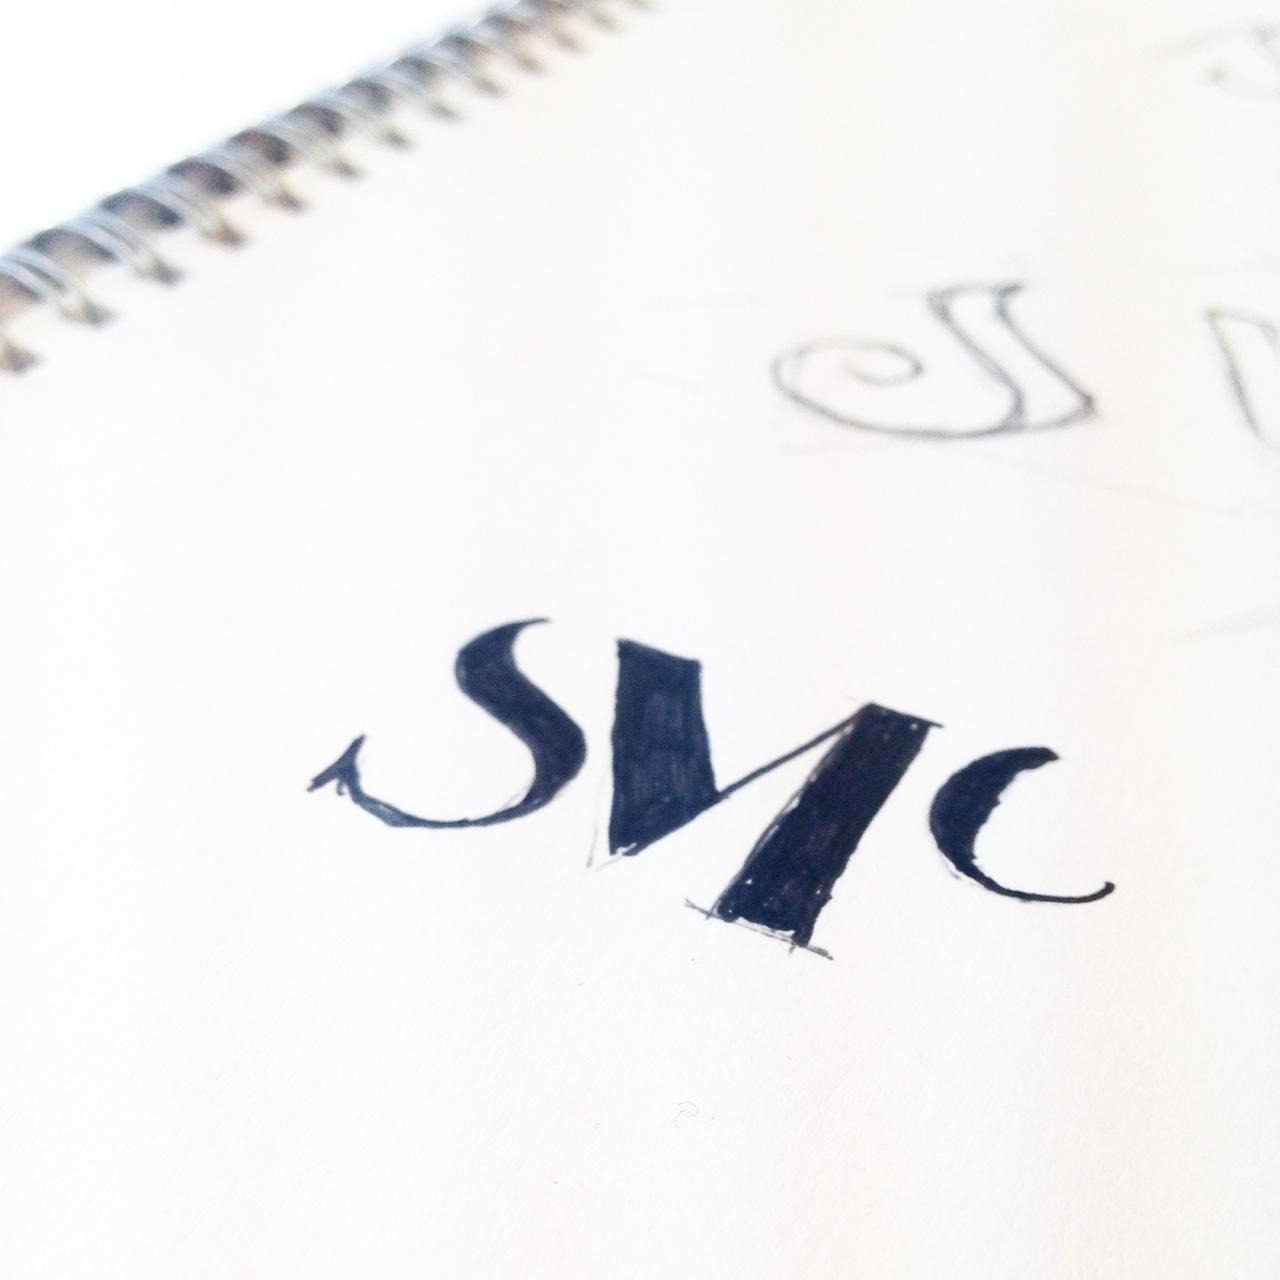 Stuart McMahon sketches